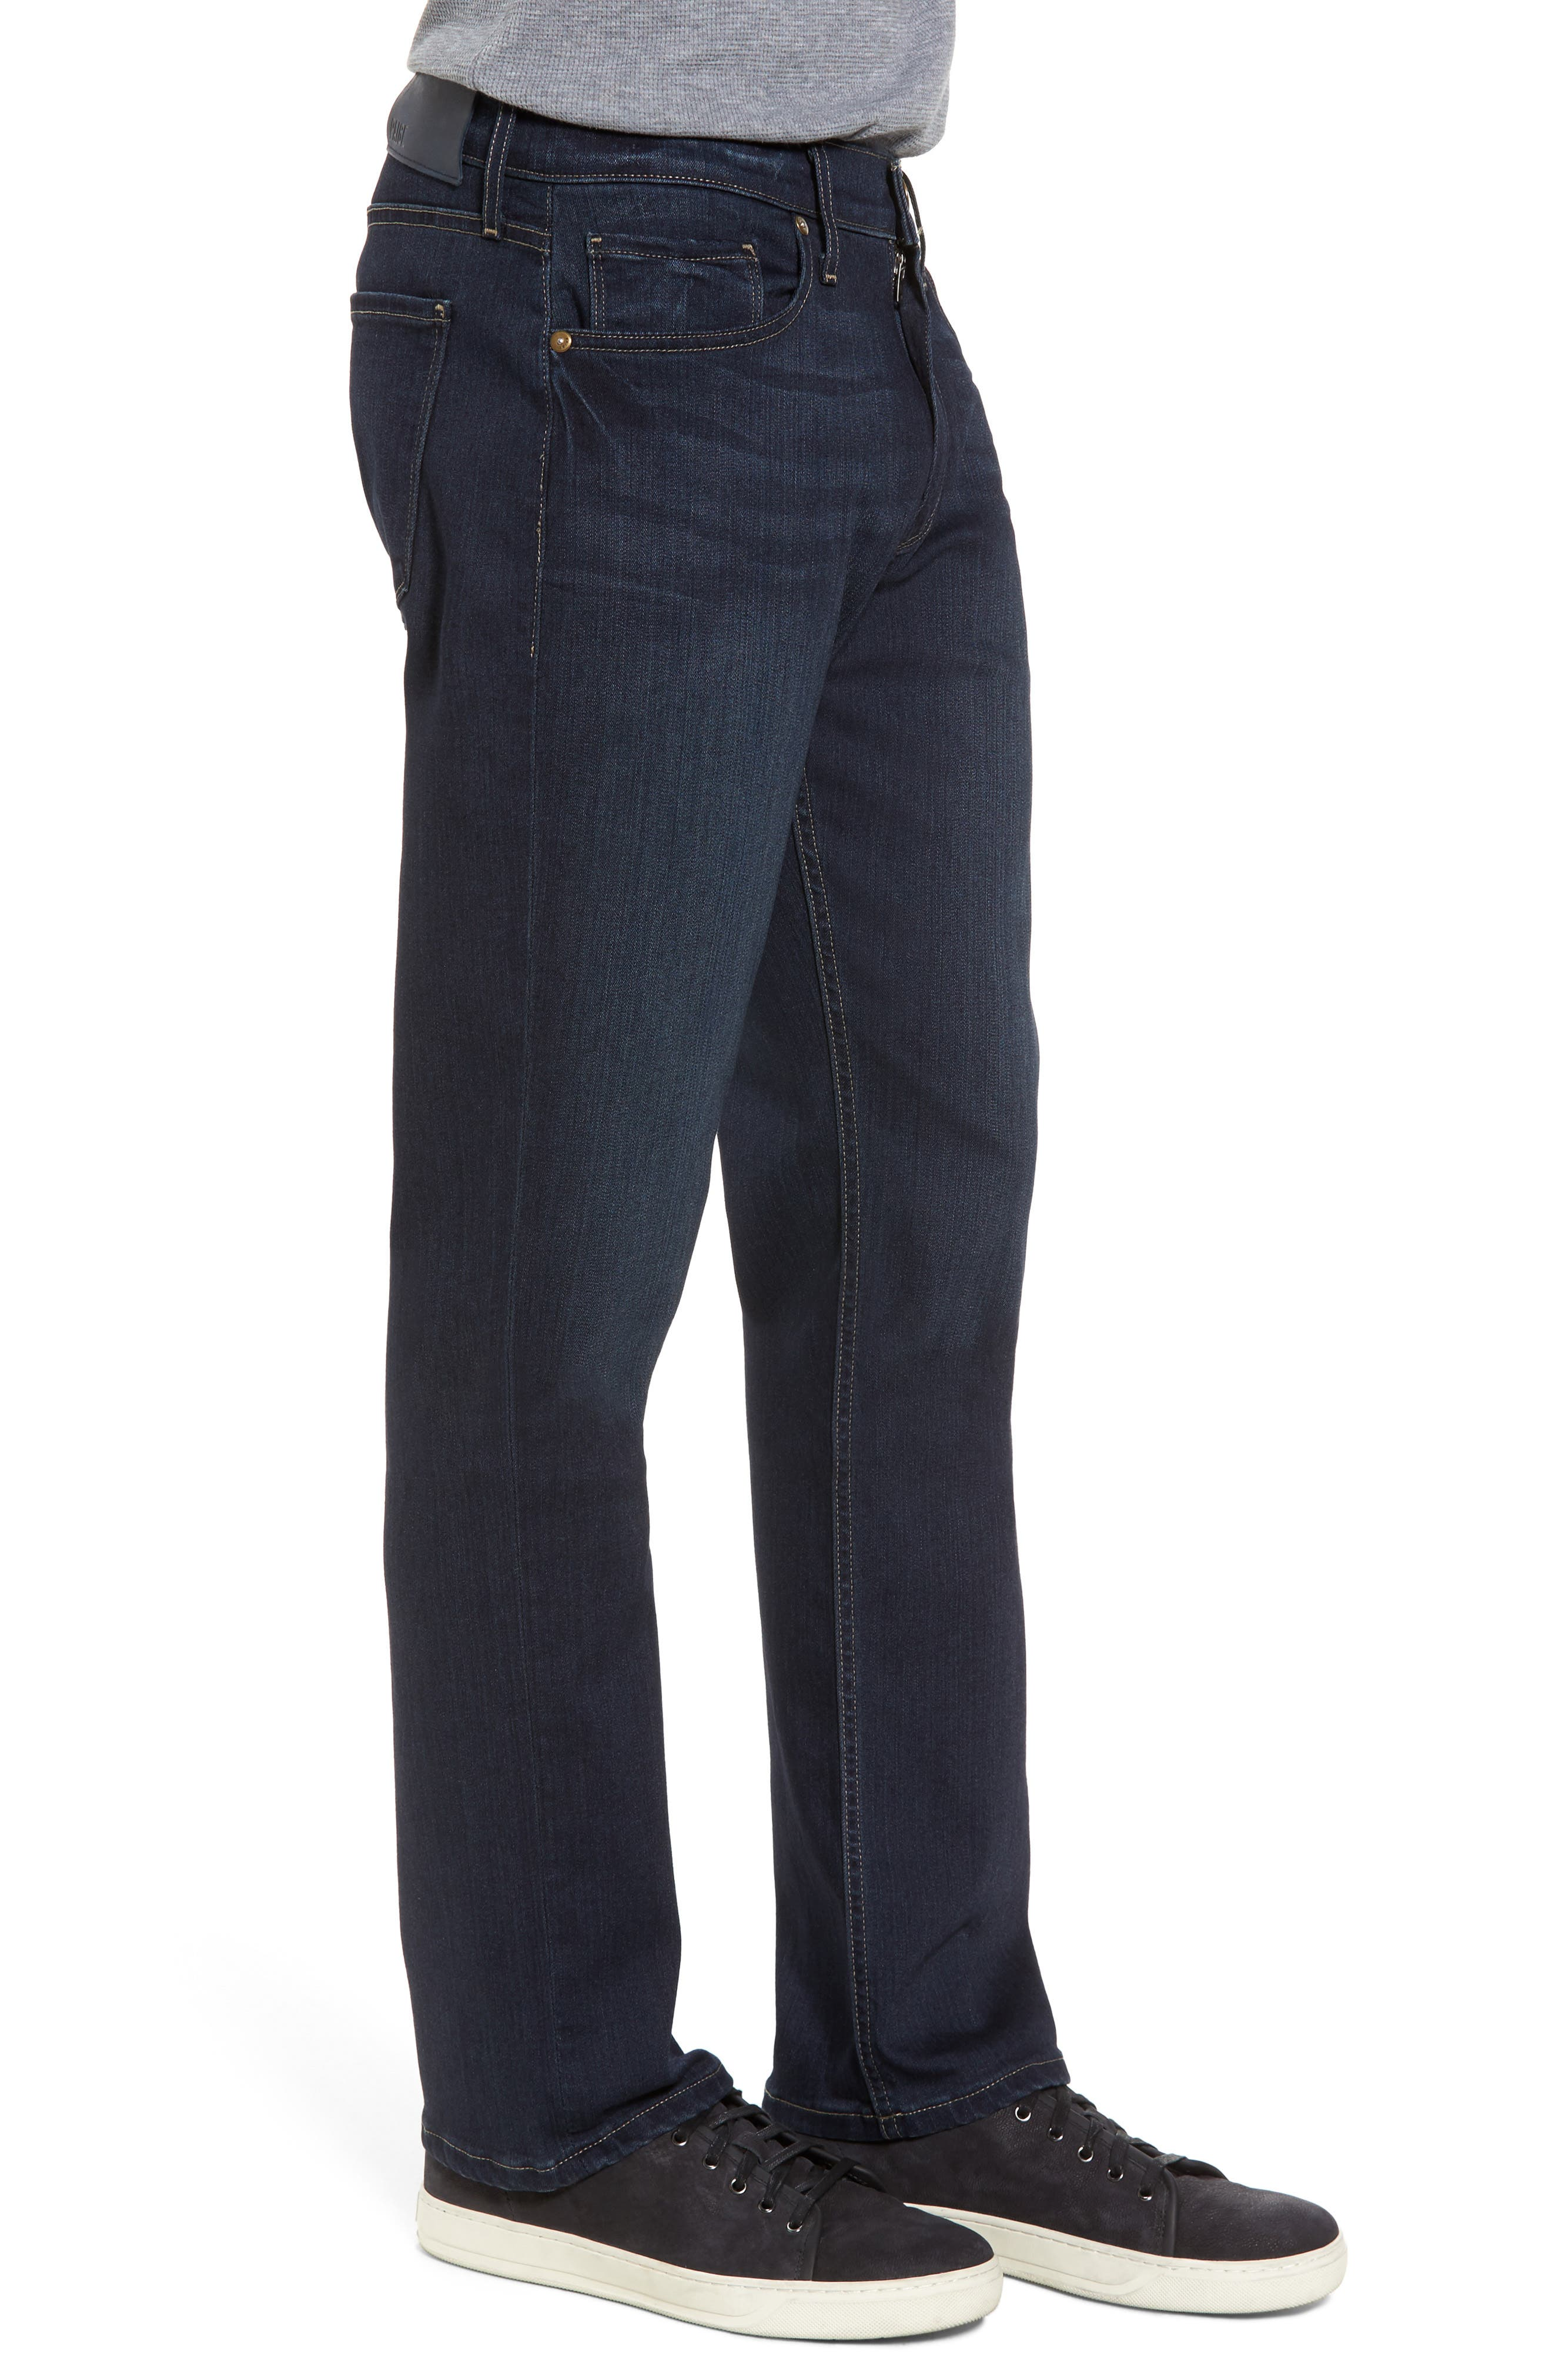 Transcend - Normandie Straight Fit Jeans,                             Alternate thumbnail 3, color,                             400